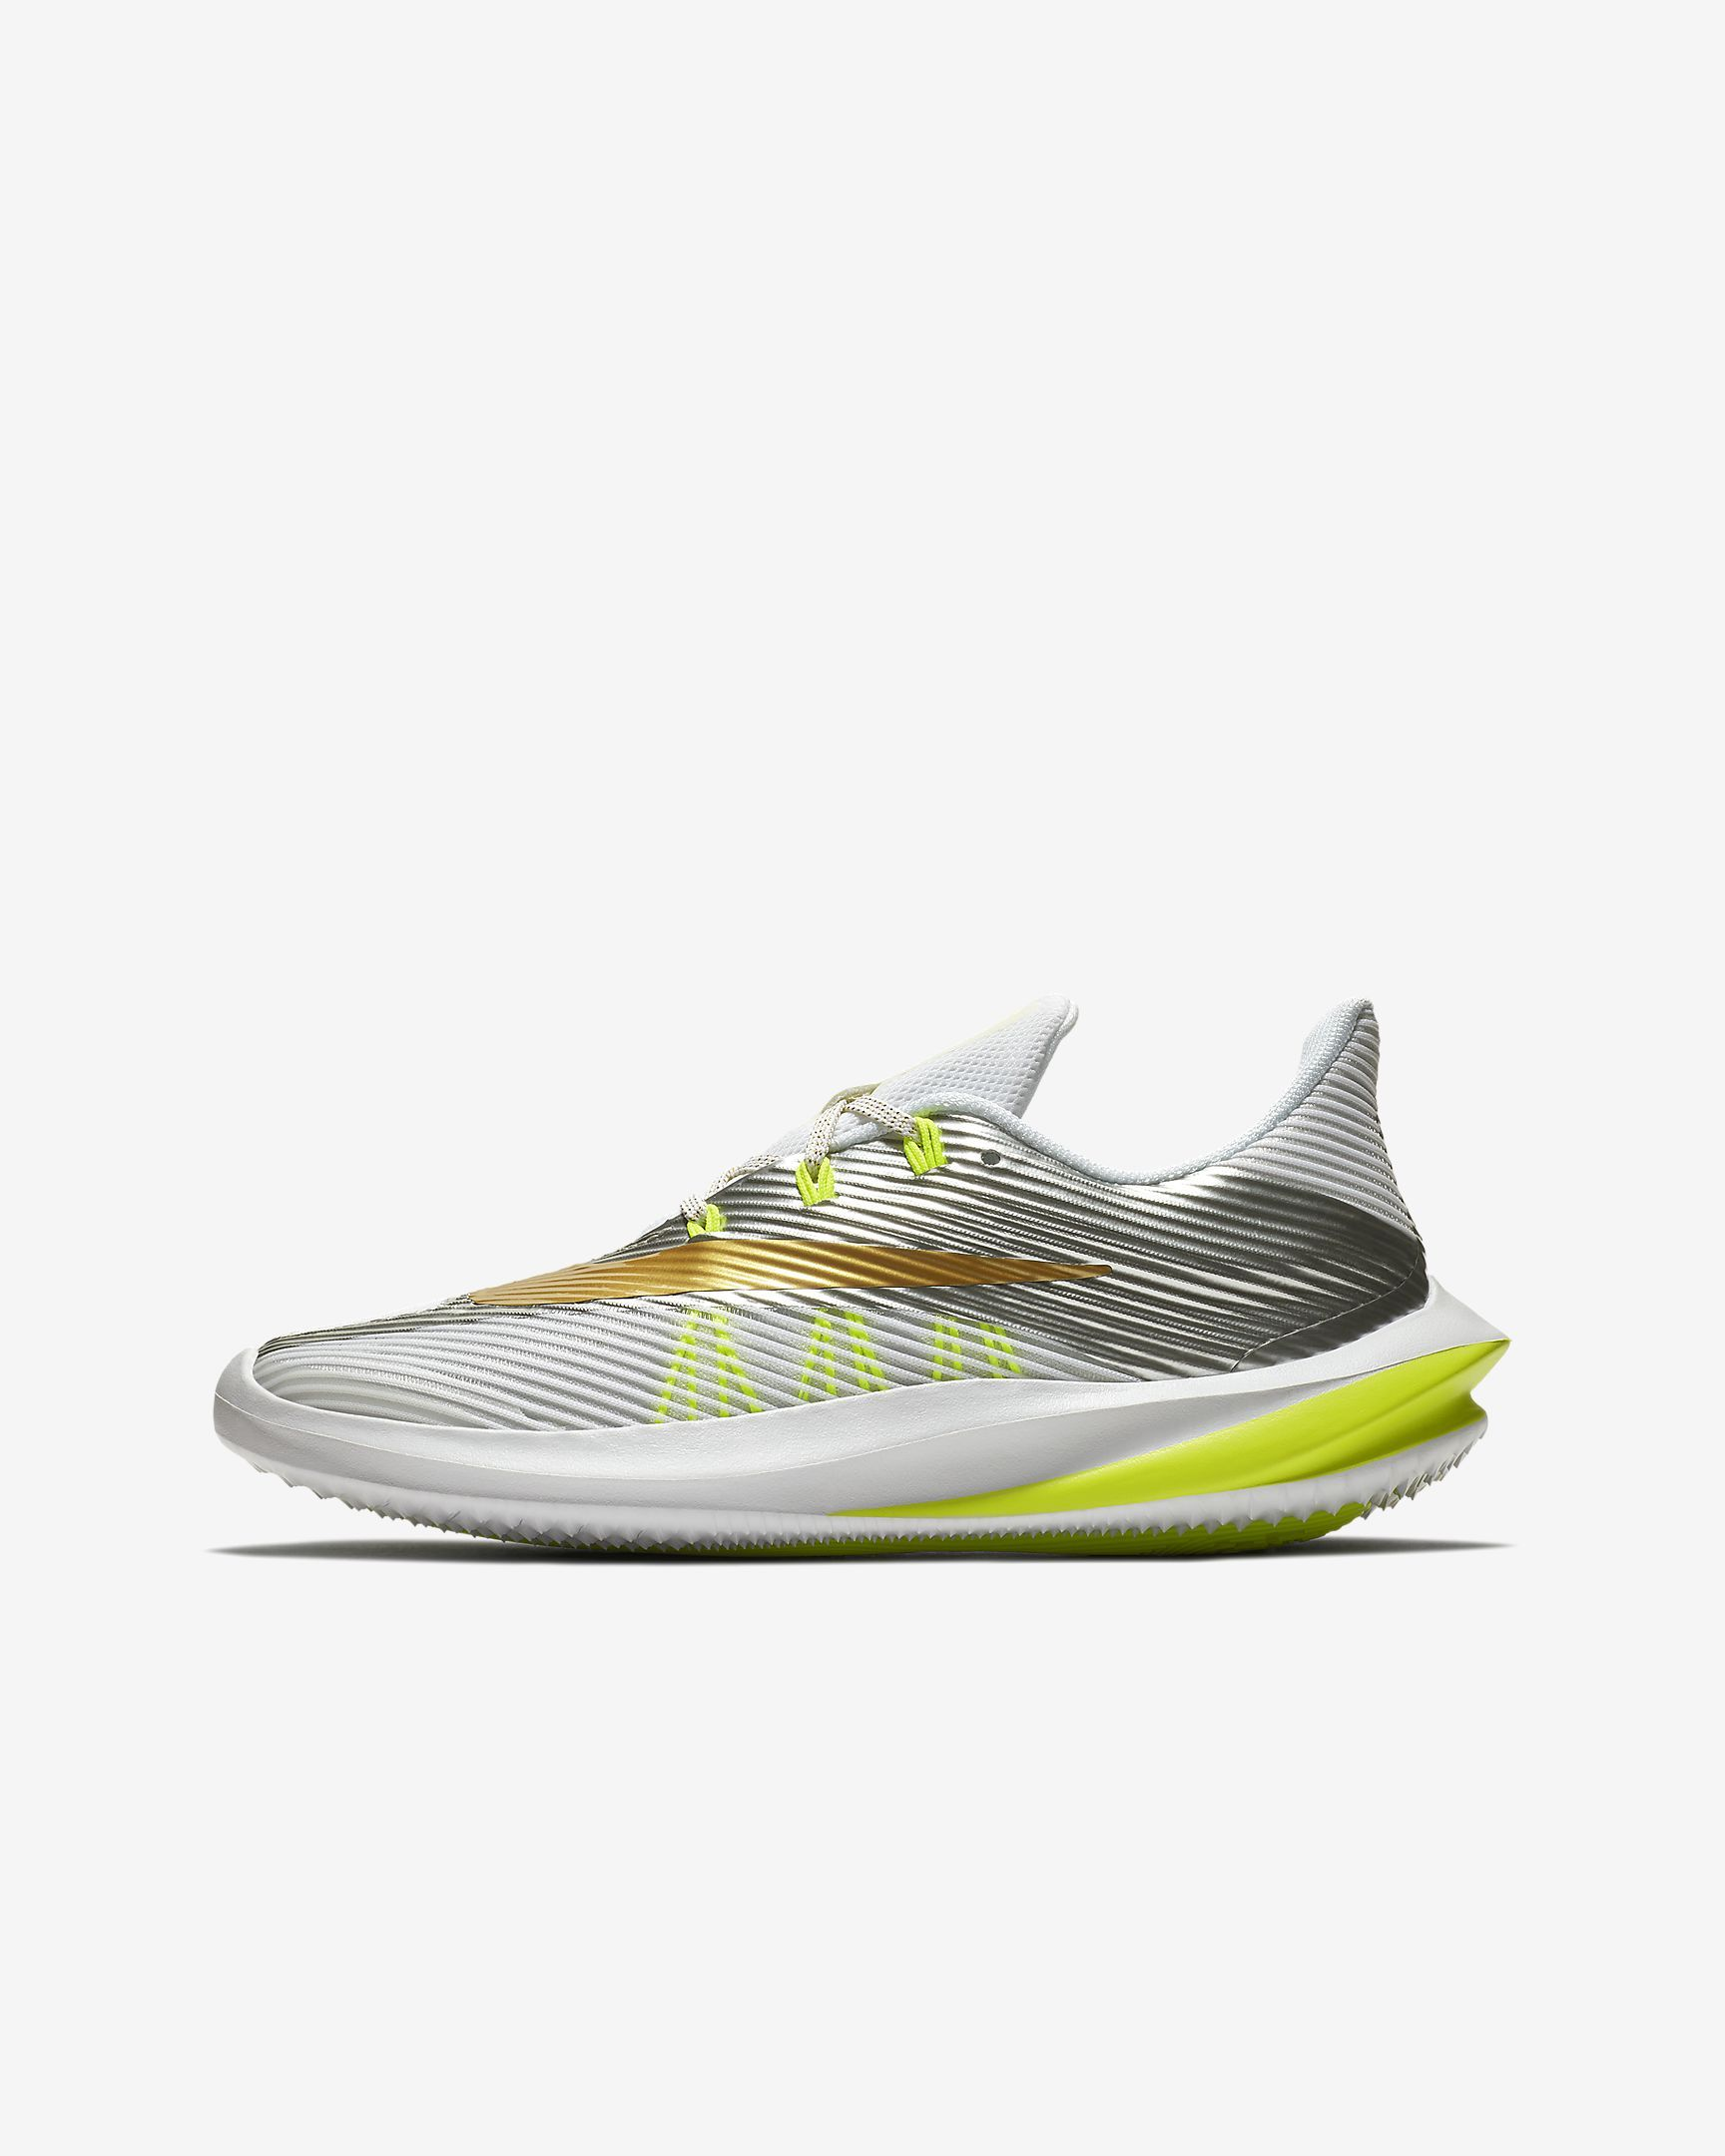 cfc1ffed06c8 Nike Future Speed Little Big Kids  Running Shoe